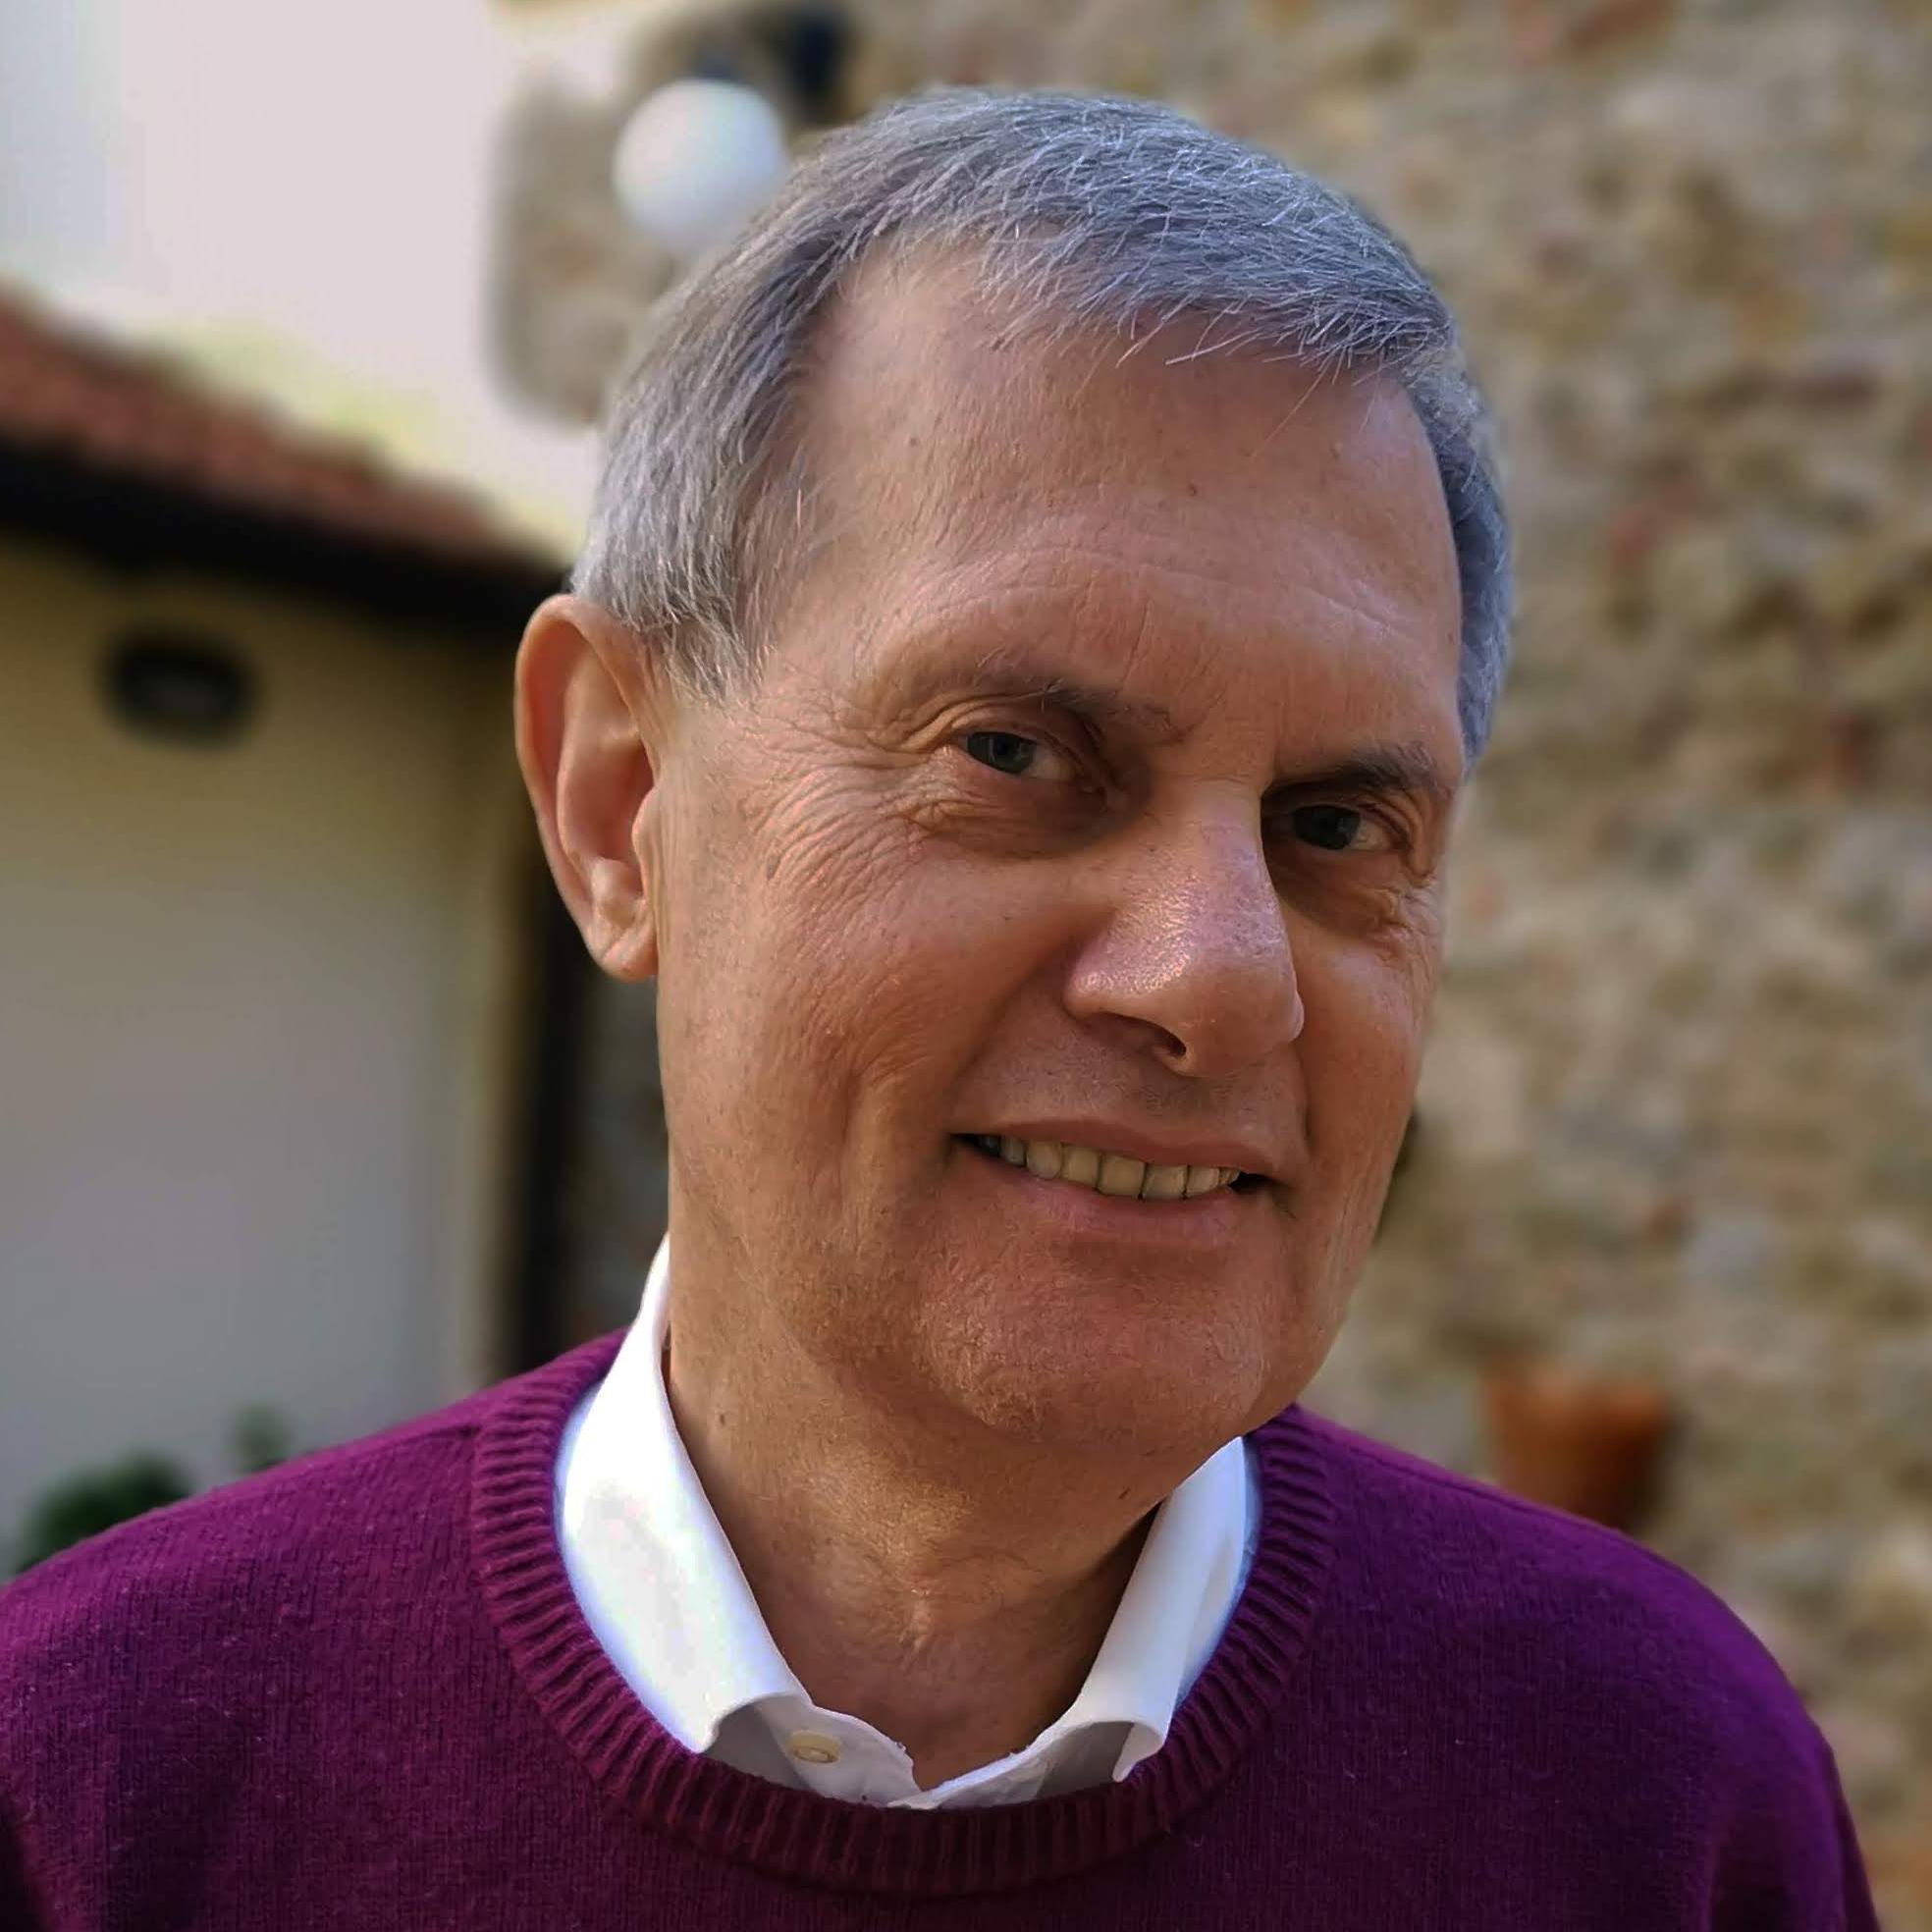 Marco Cerofolini